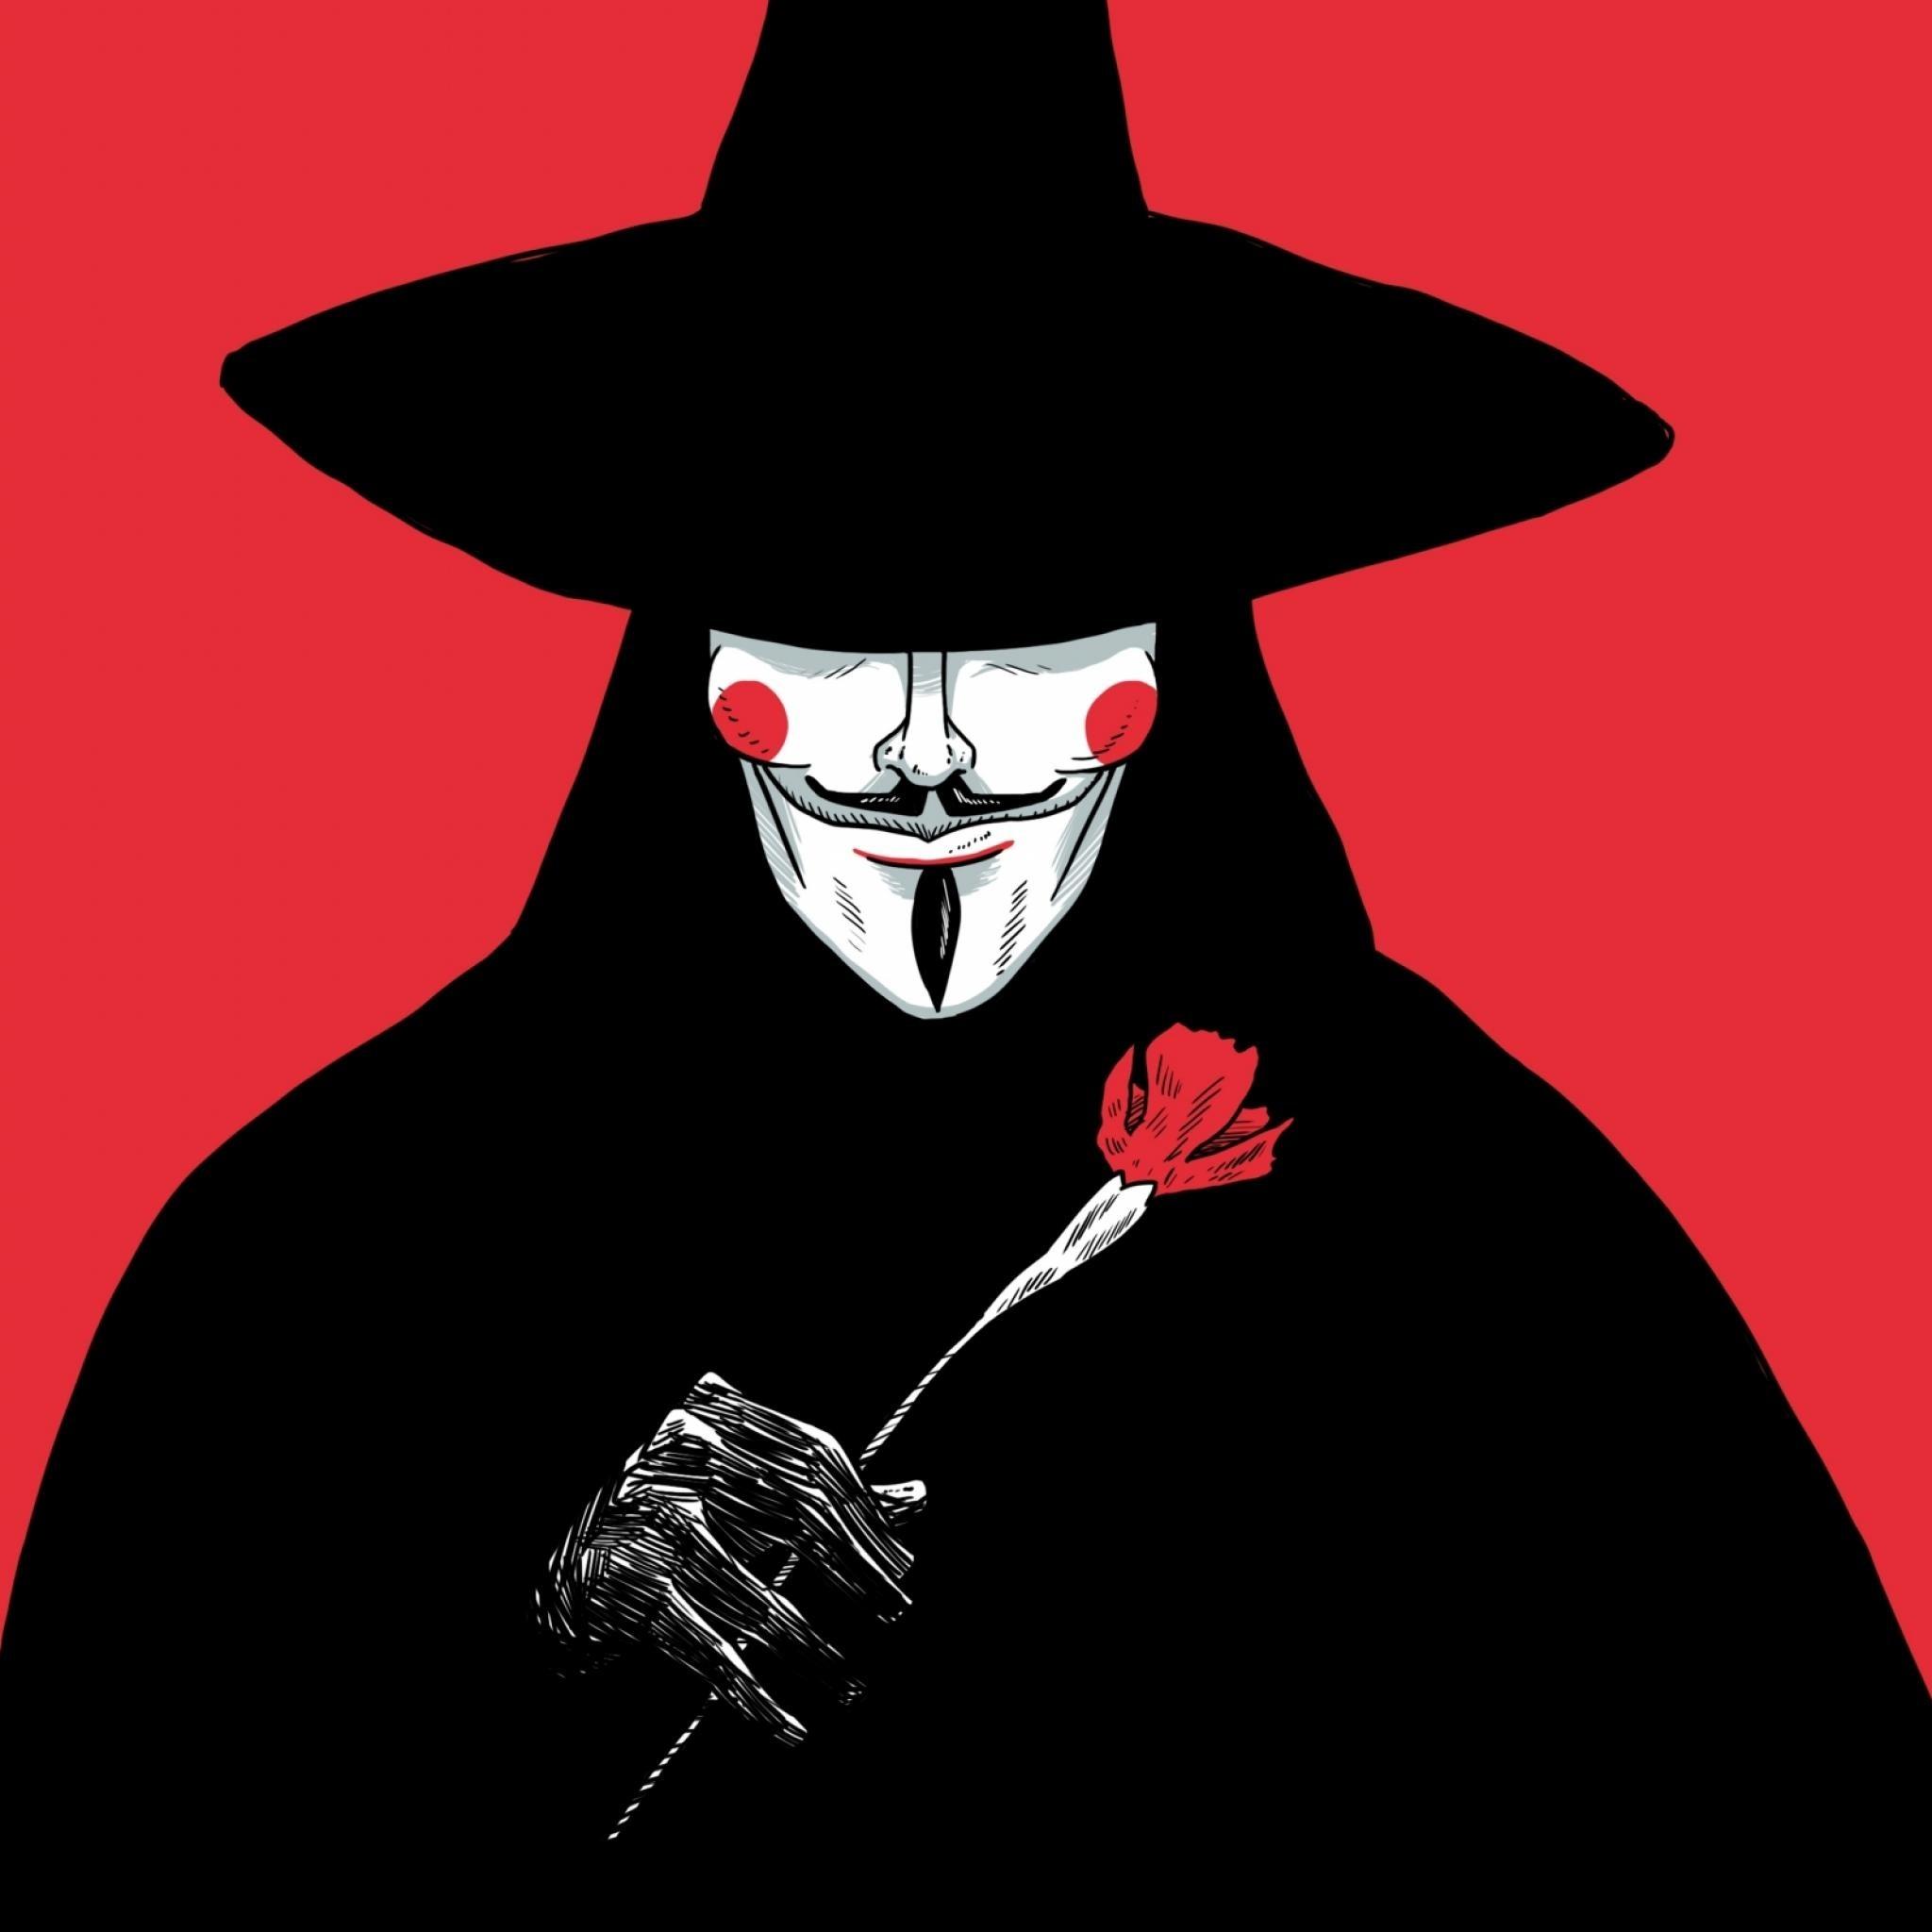 V For Vendetta iPad Wallpaper HD #iPad #wallpaper